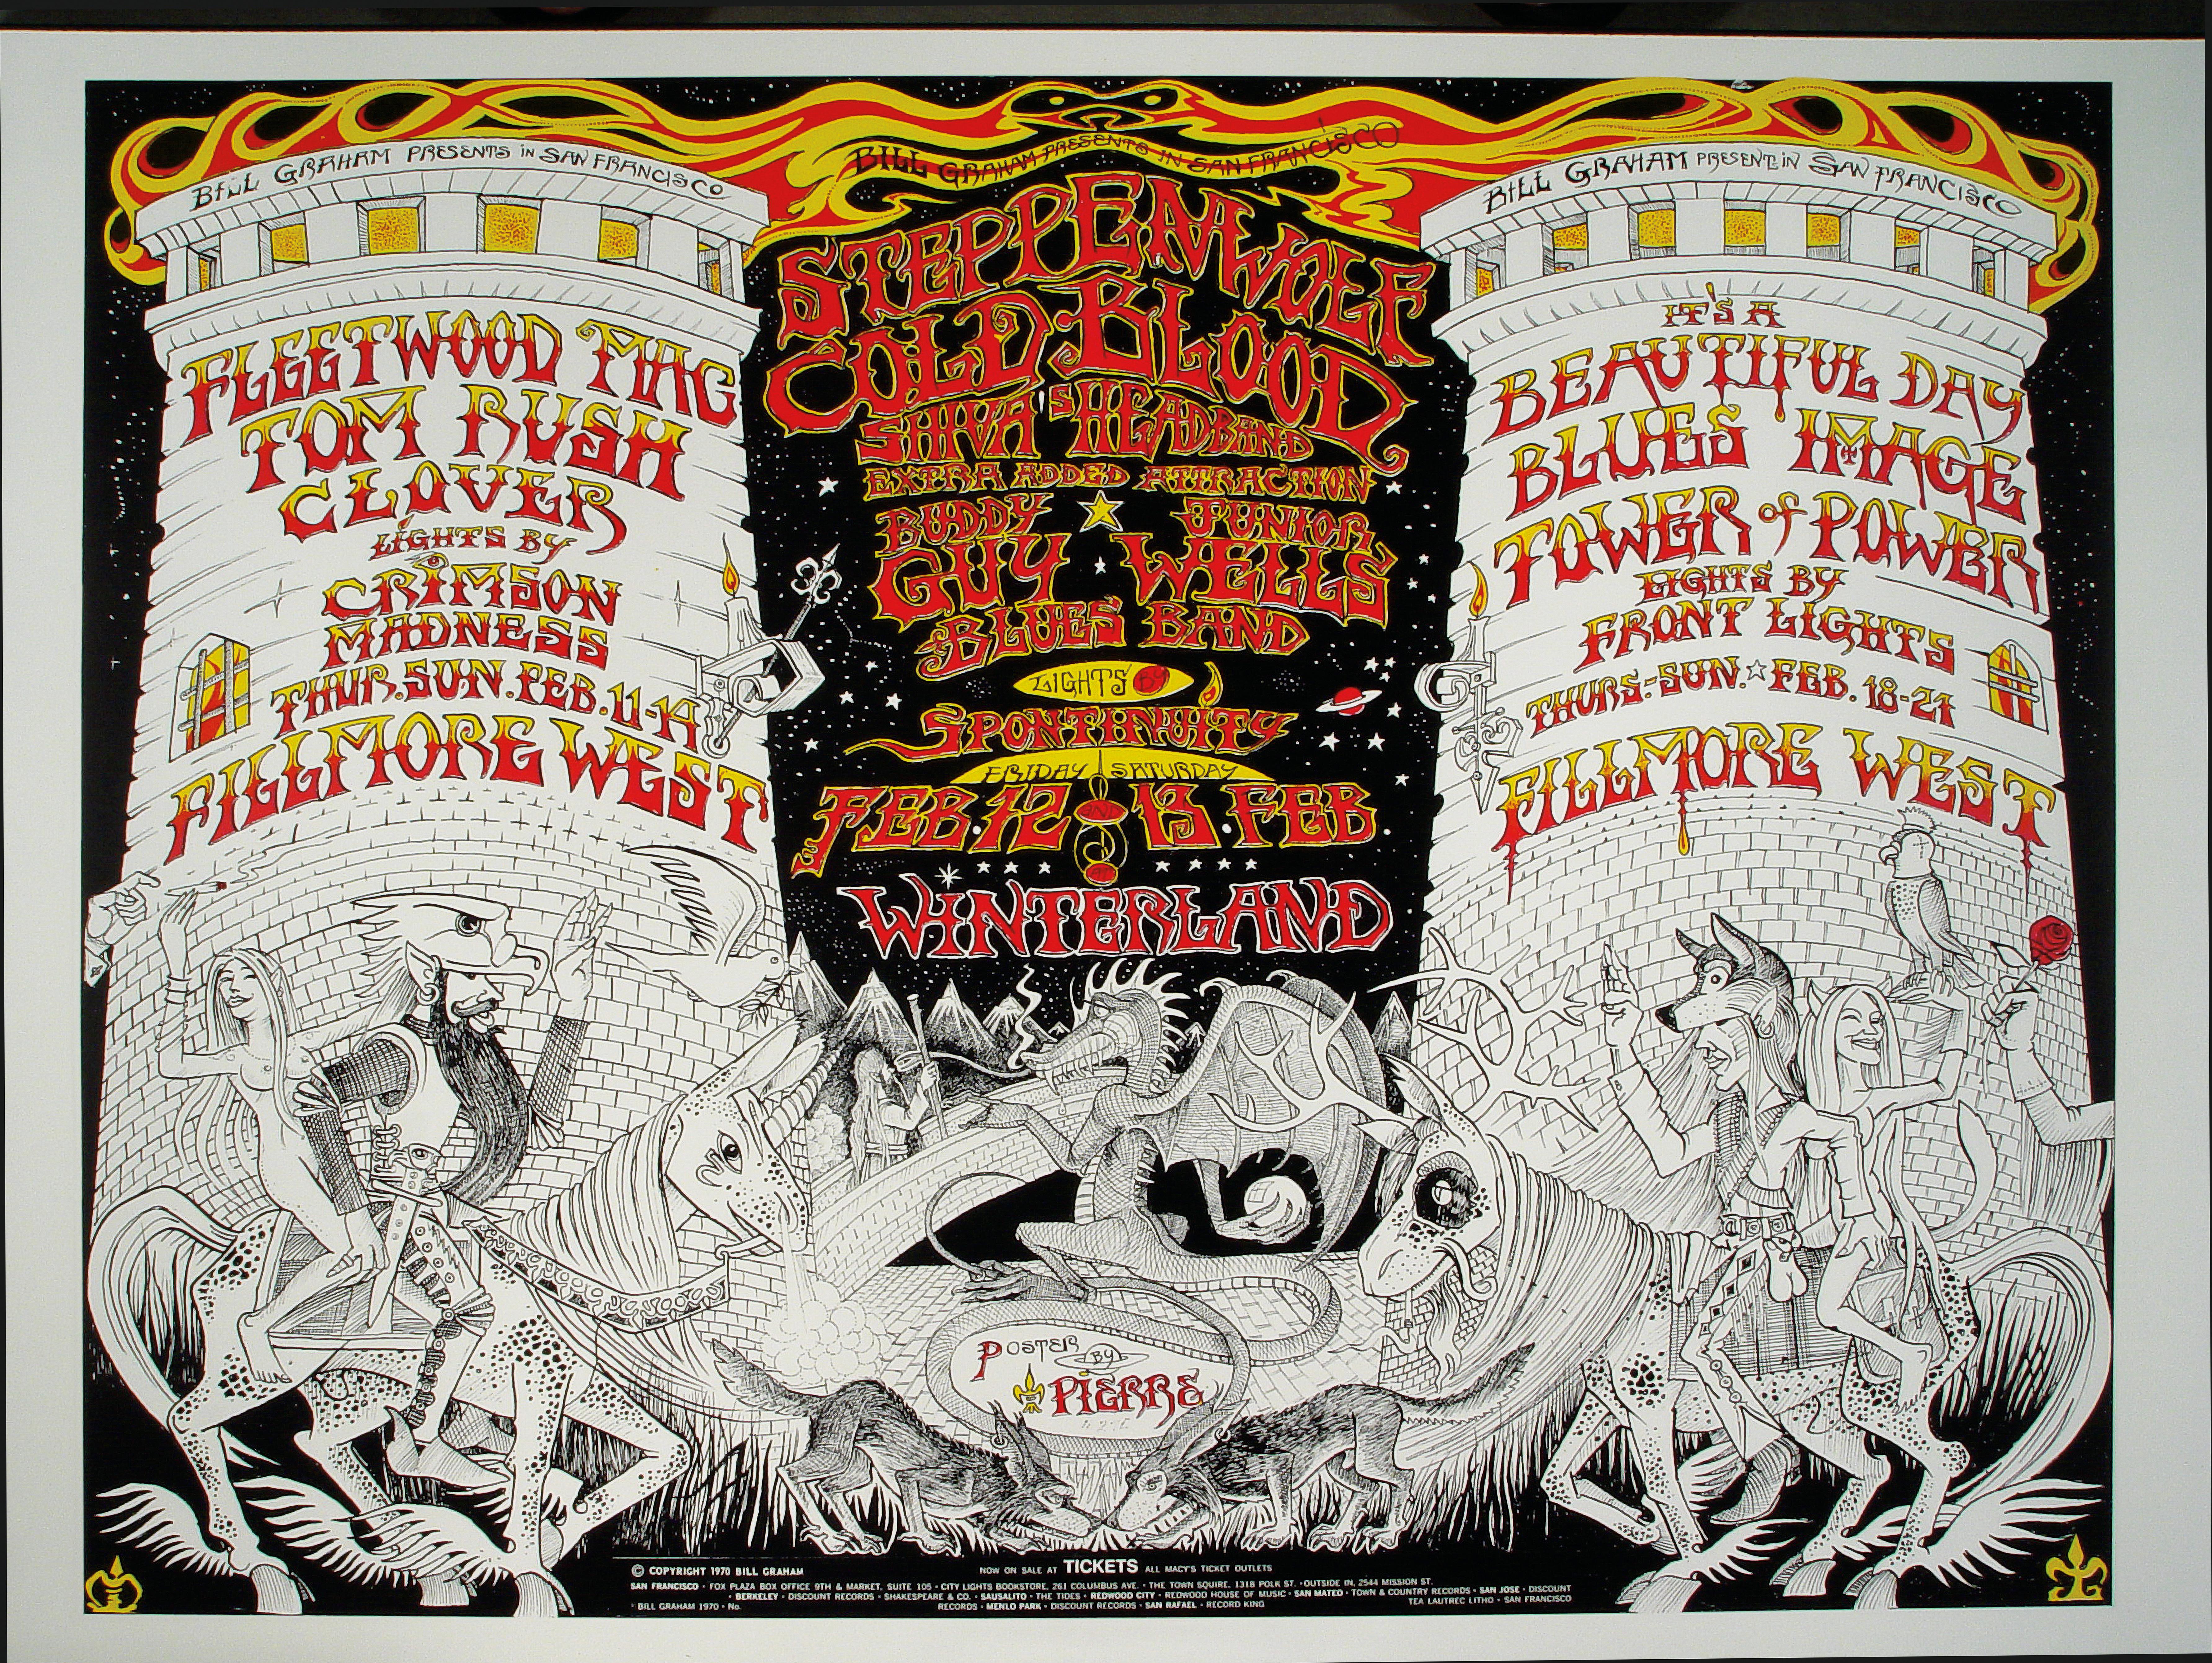 Fleetwood MacHandbill